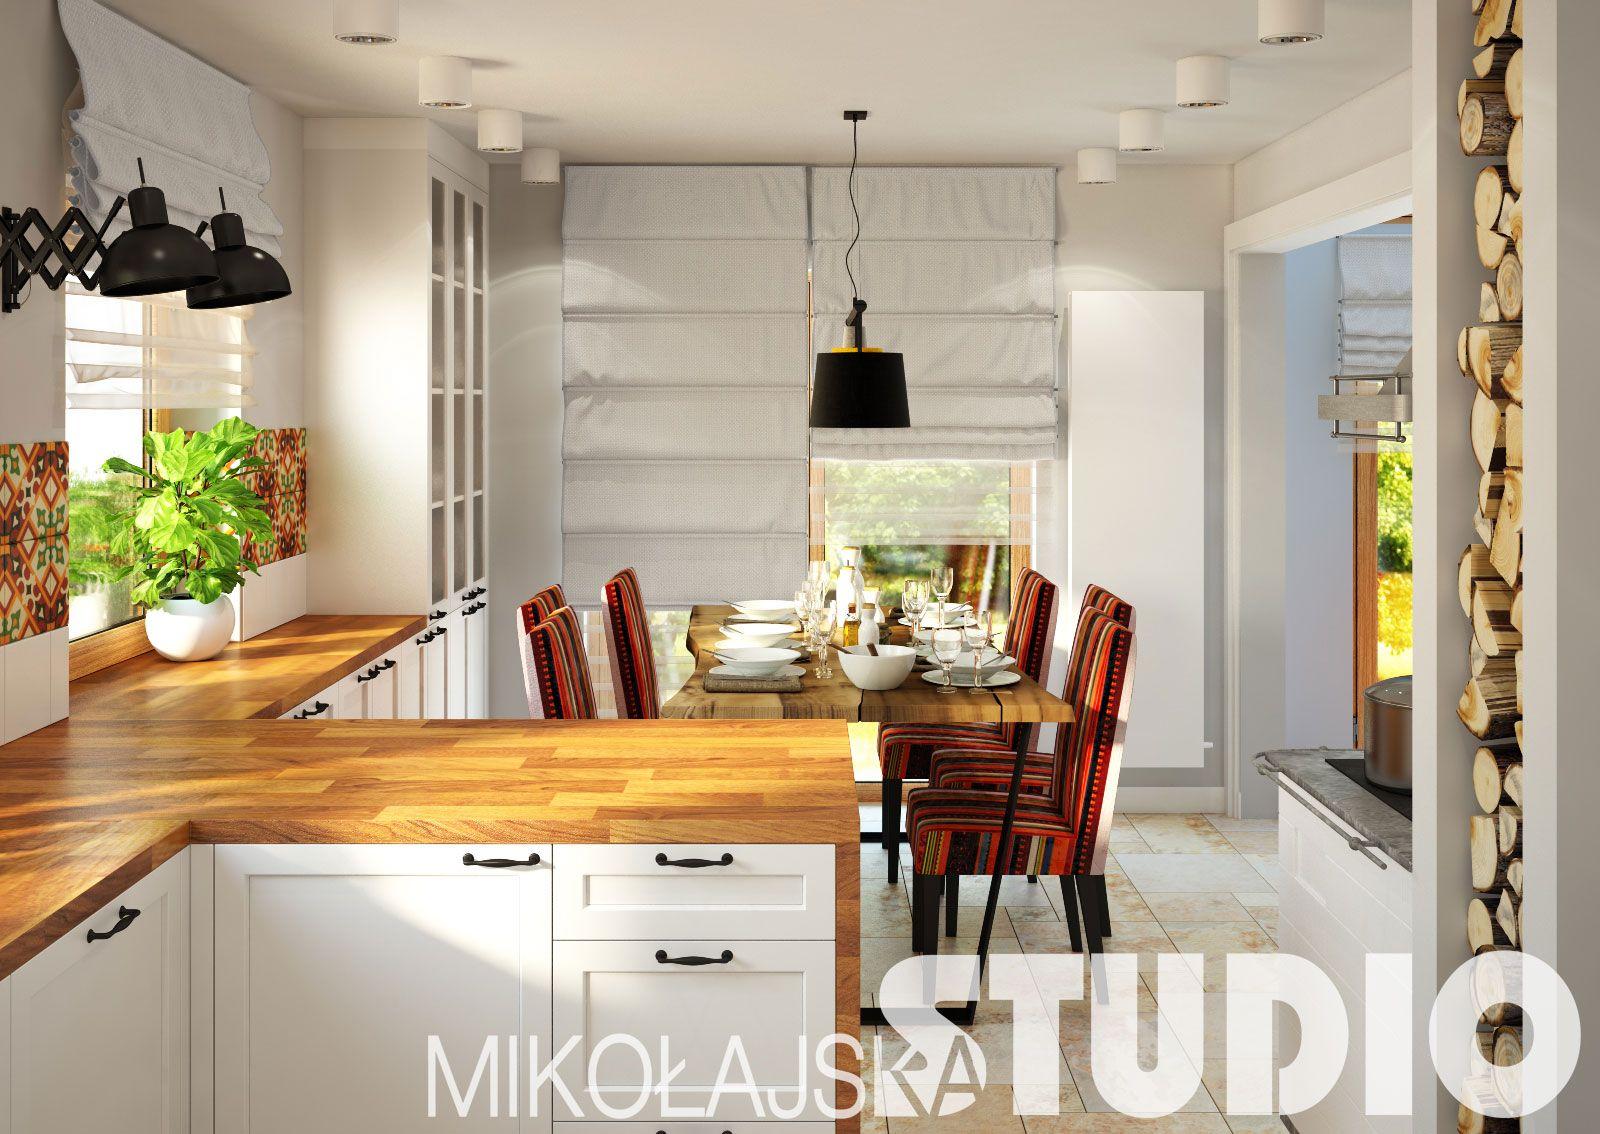 Kuchnia Z Jadalnia W Stylu Boho Kitchen Interior Boho Interior Design Interior Design Kitchen